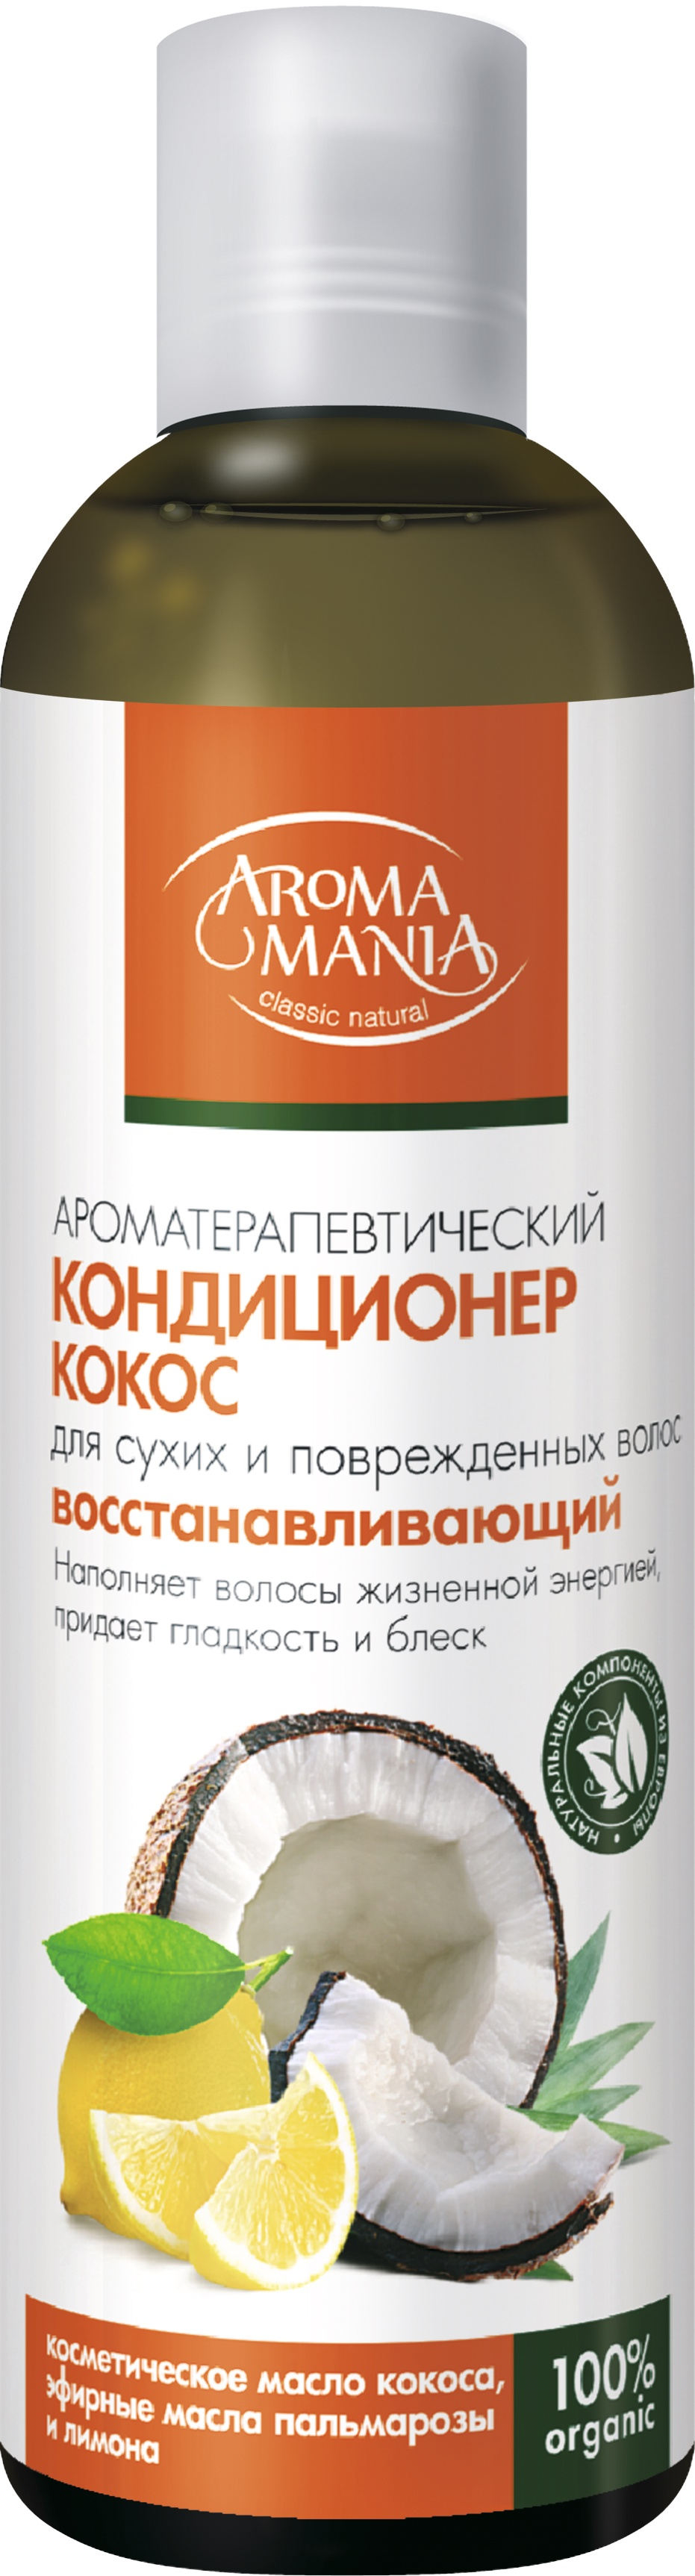 Кондиционер для волос AROMA MANIA КОКОС 250 мл